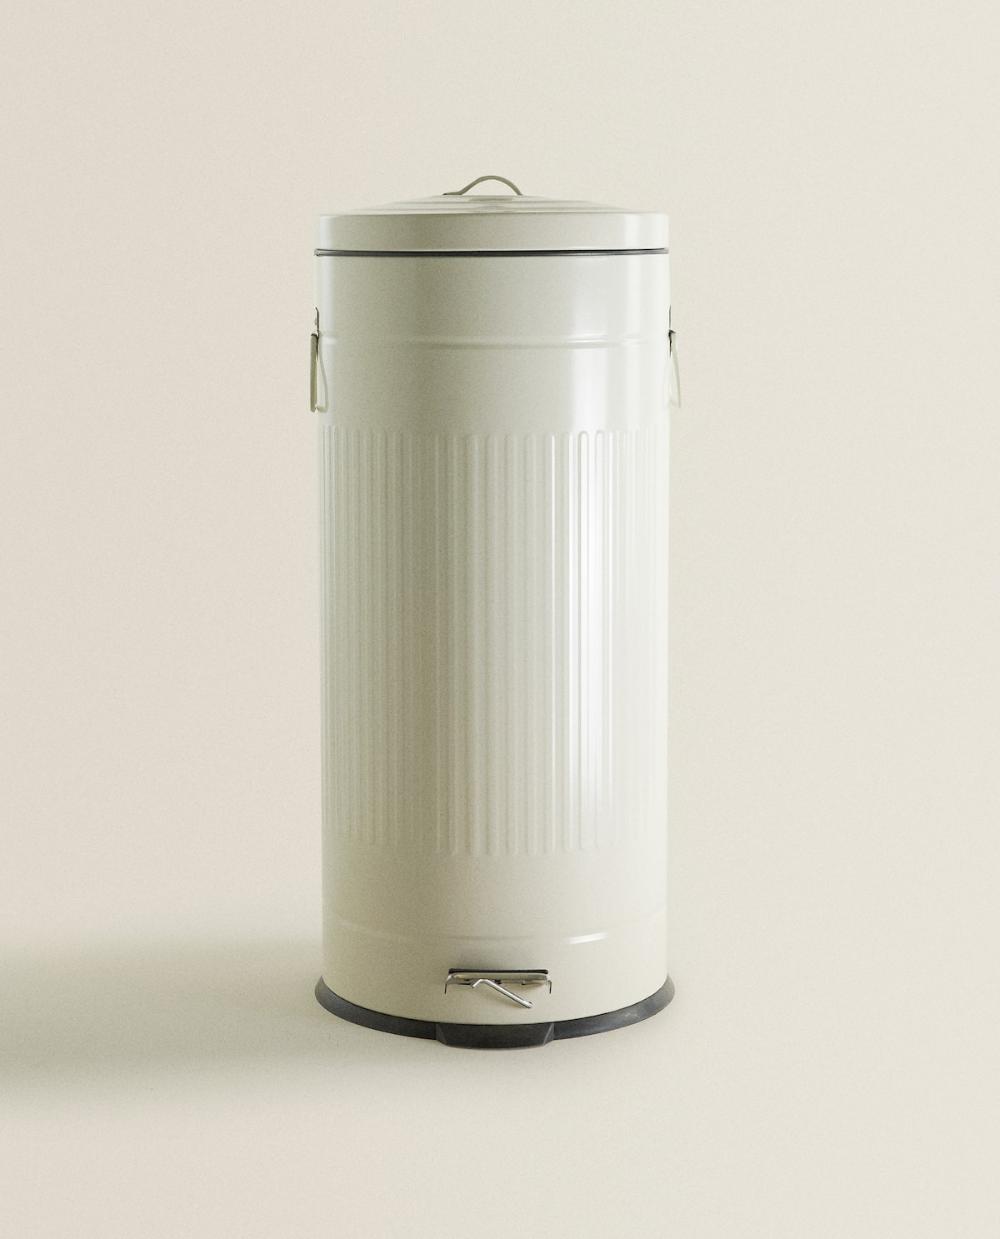 Kitchen Trash Can With Images Kitchen Trash Cans Zara Home Kitchen Bin